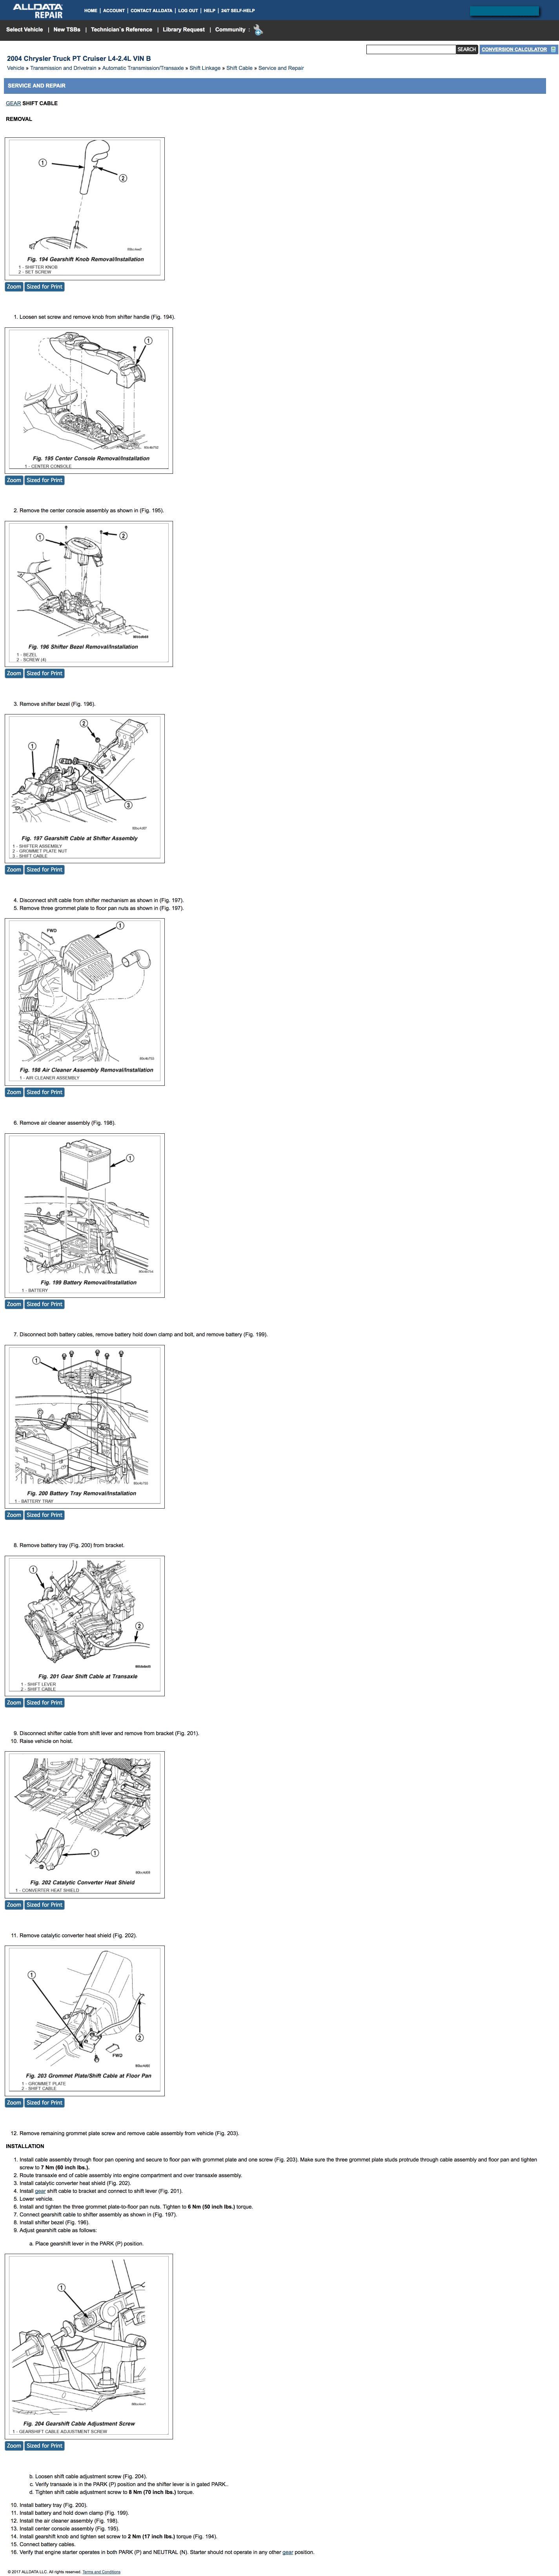 pt cruiser manual transmission shift linkage